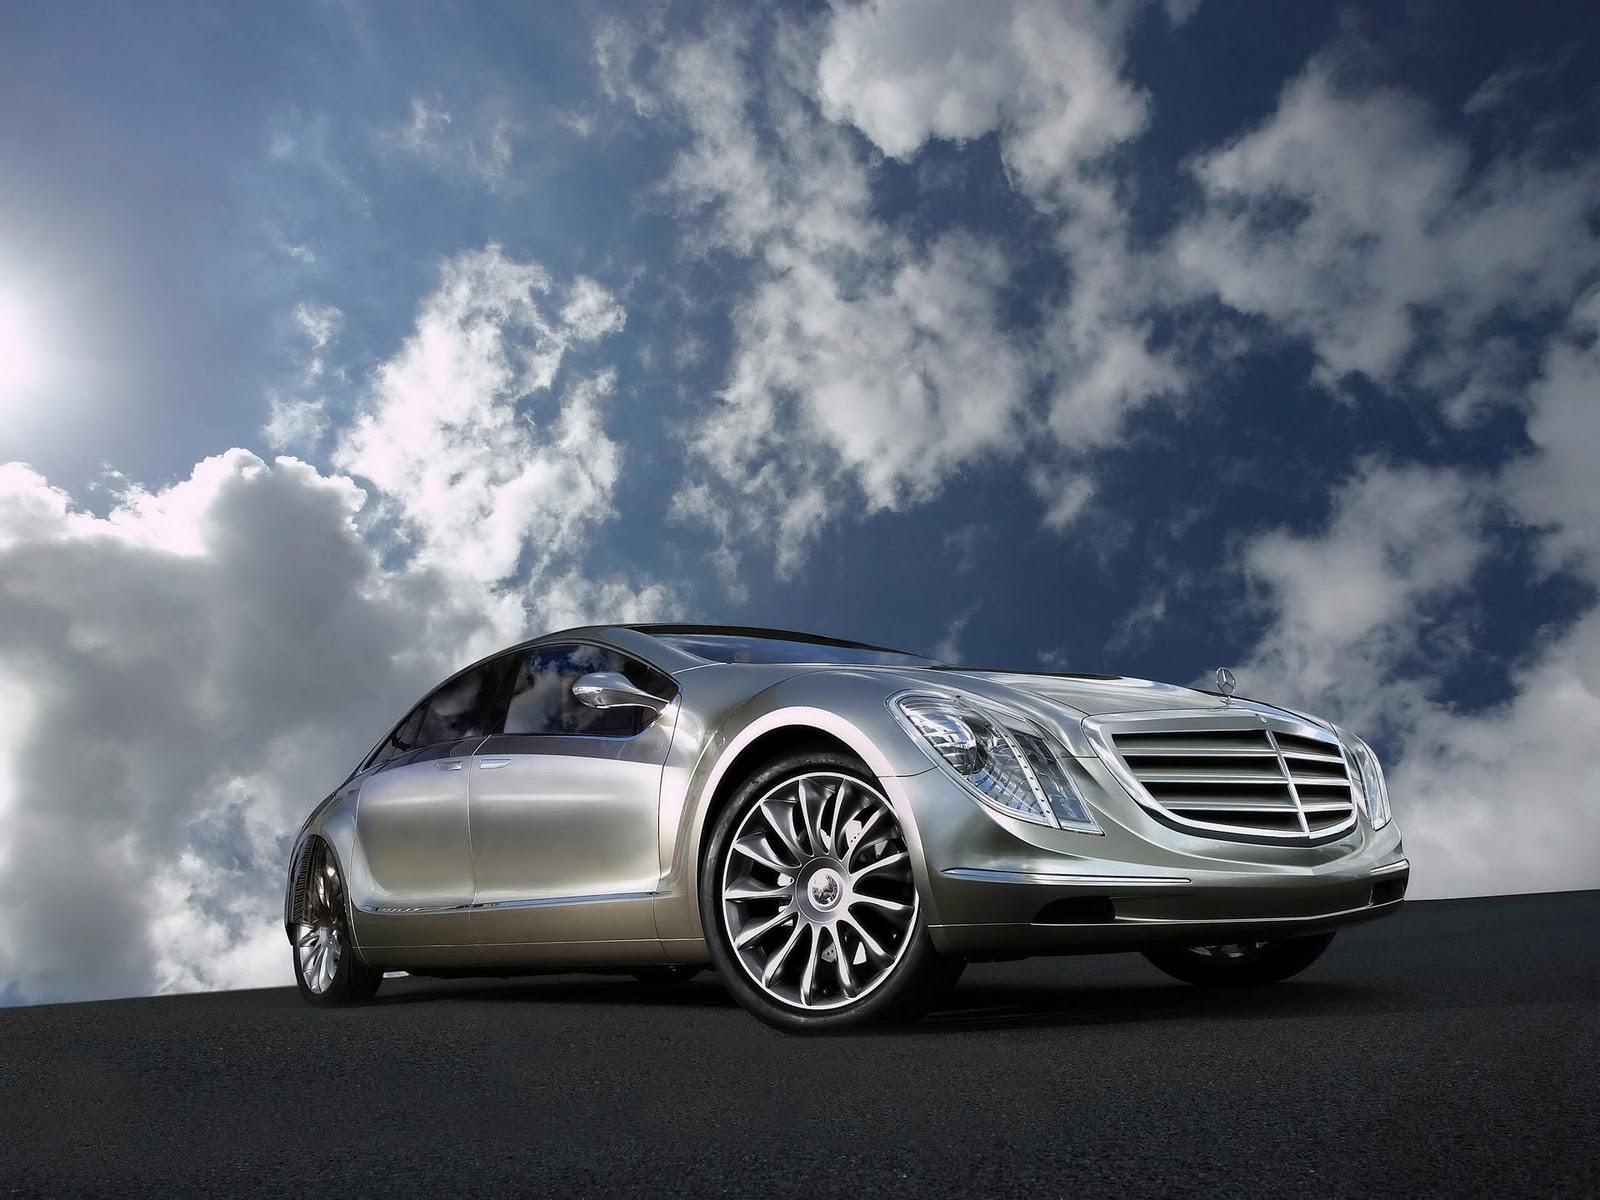 Mercedes benz wallpaper desktop Cars N Bikes 1600x1200